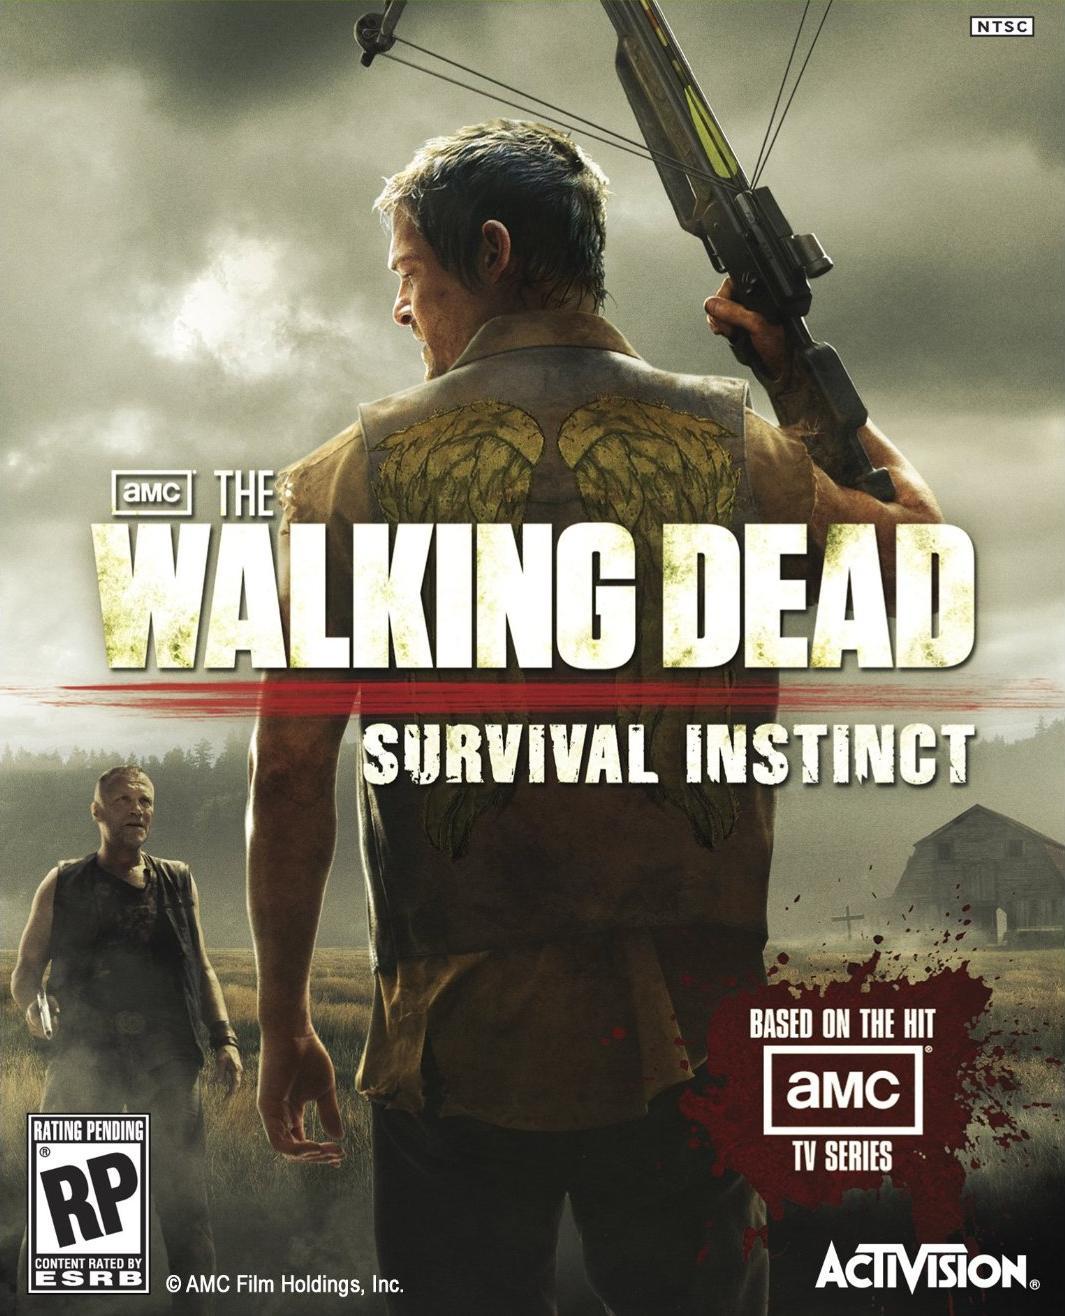 The walking dead instinct survior 2